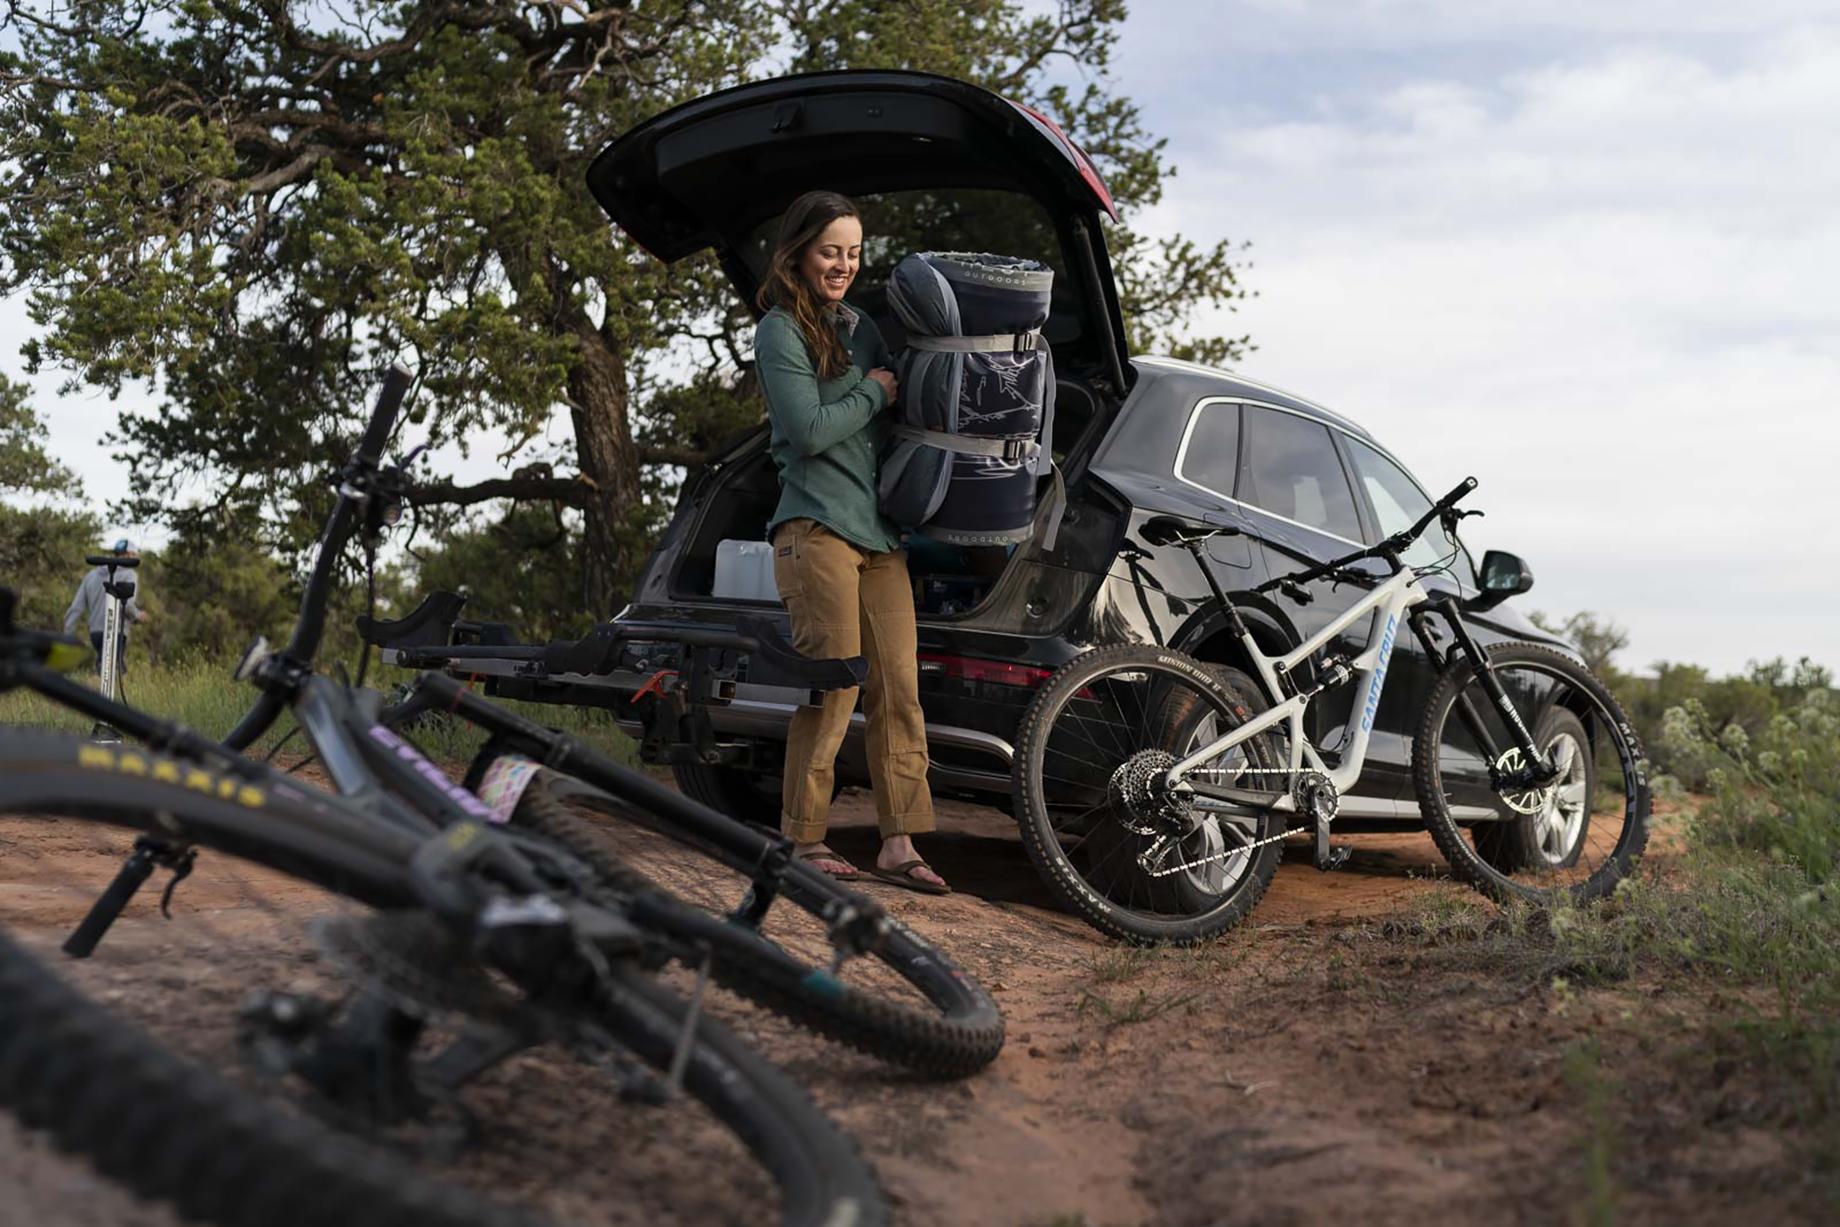 Woman on mountain biking trip in Moab desert removes bundled Hest mattress from car shot by Motofish